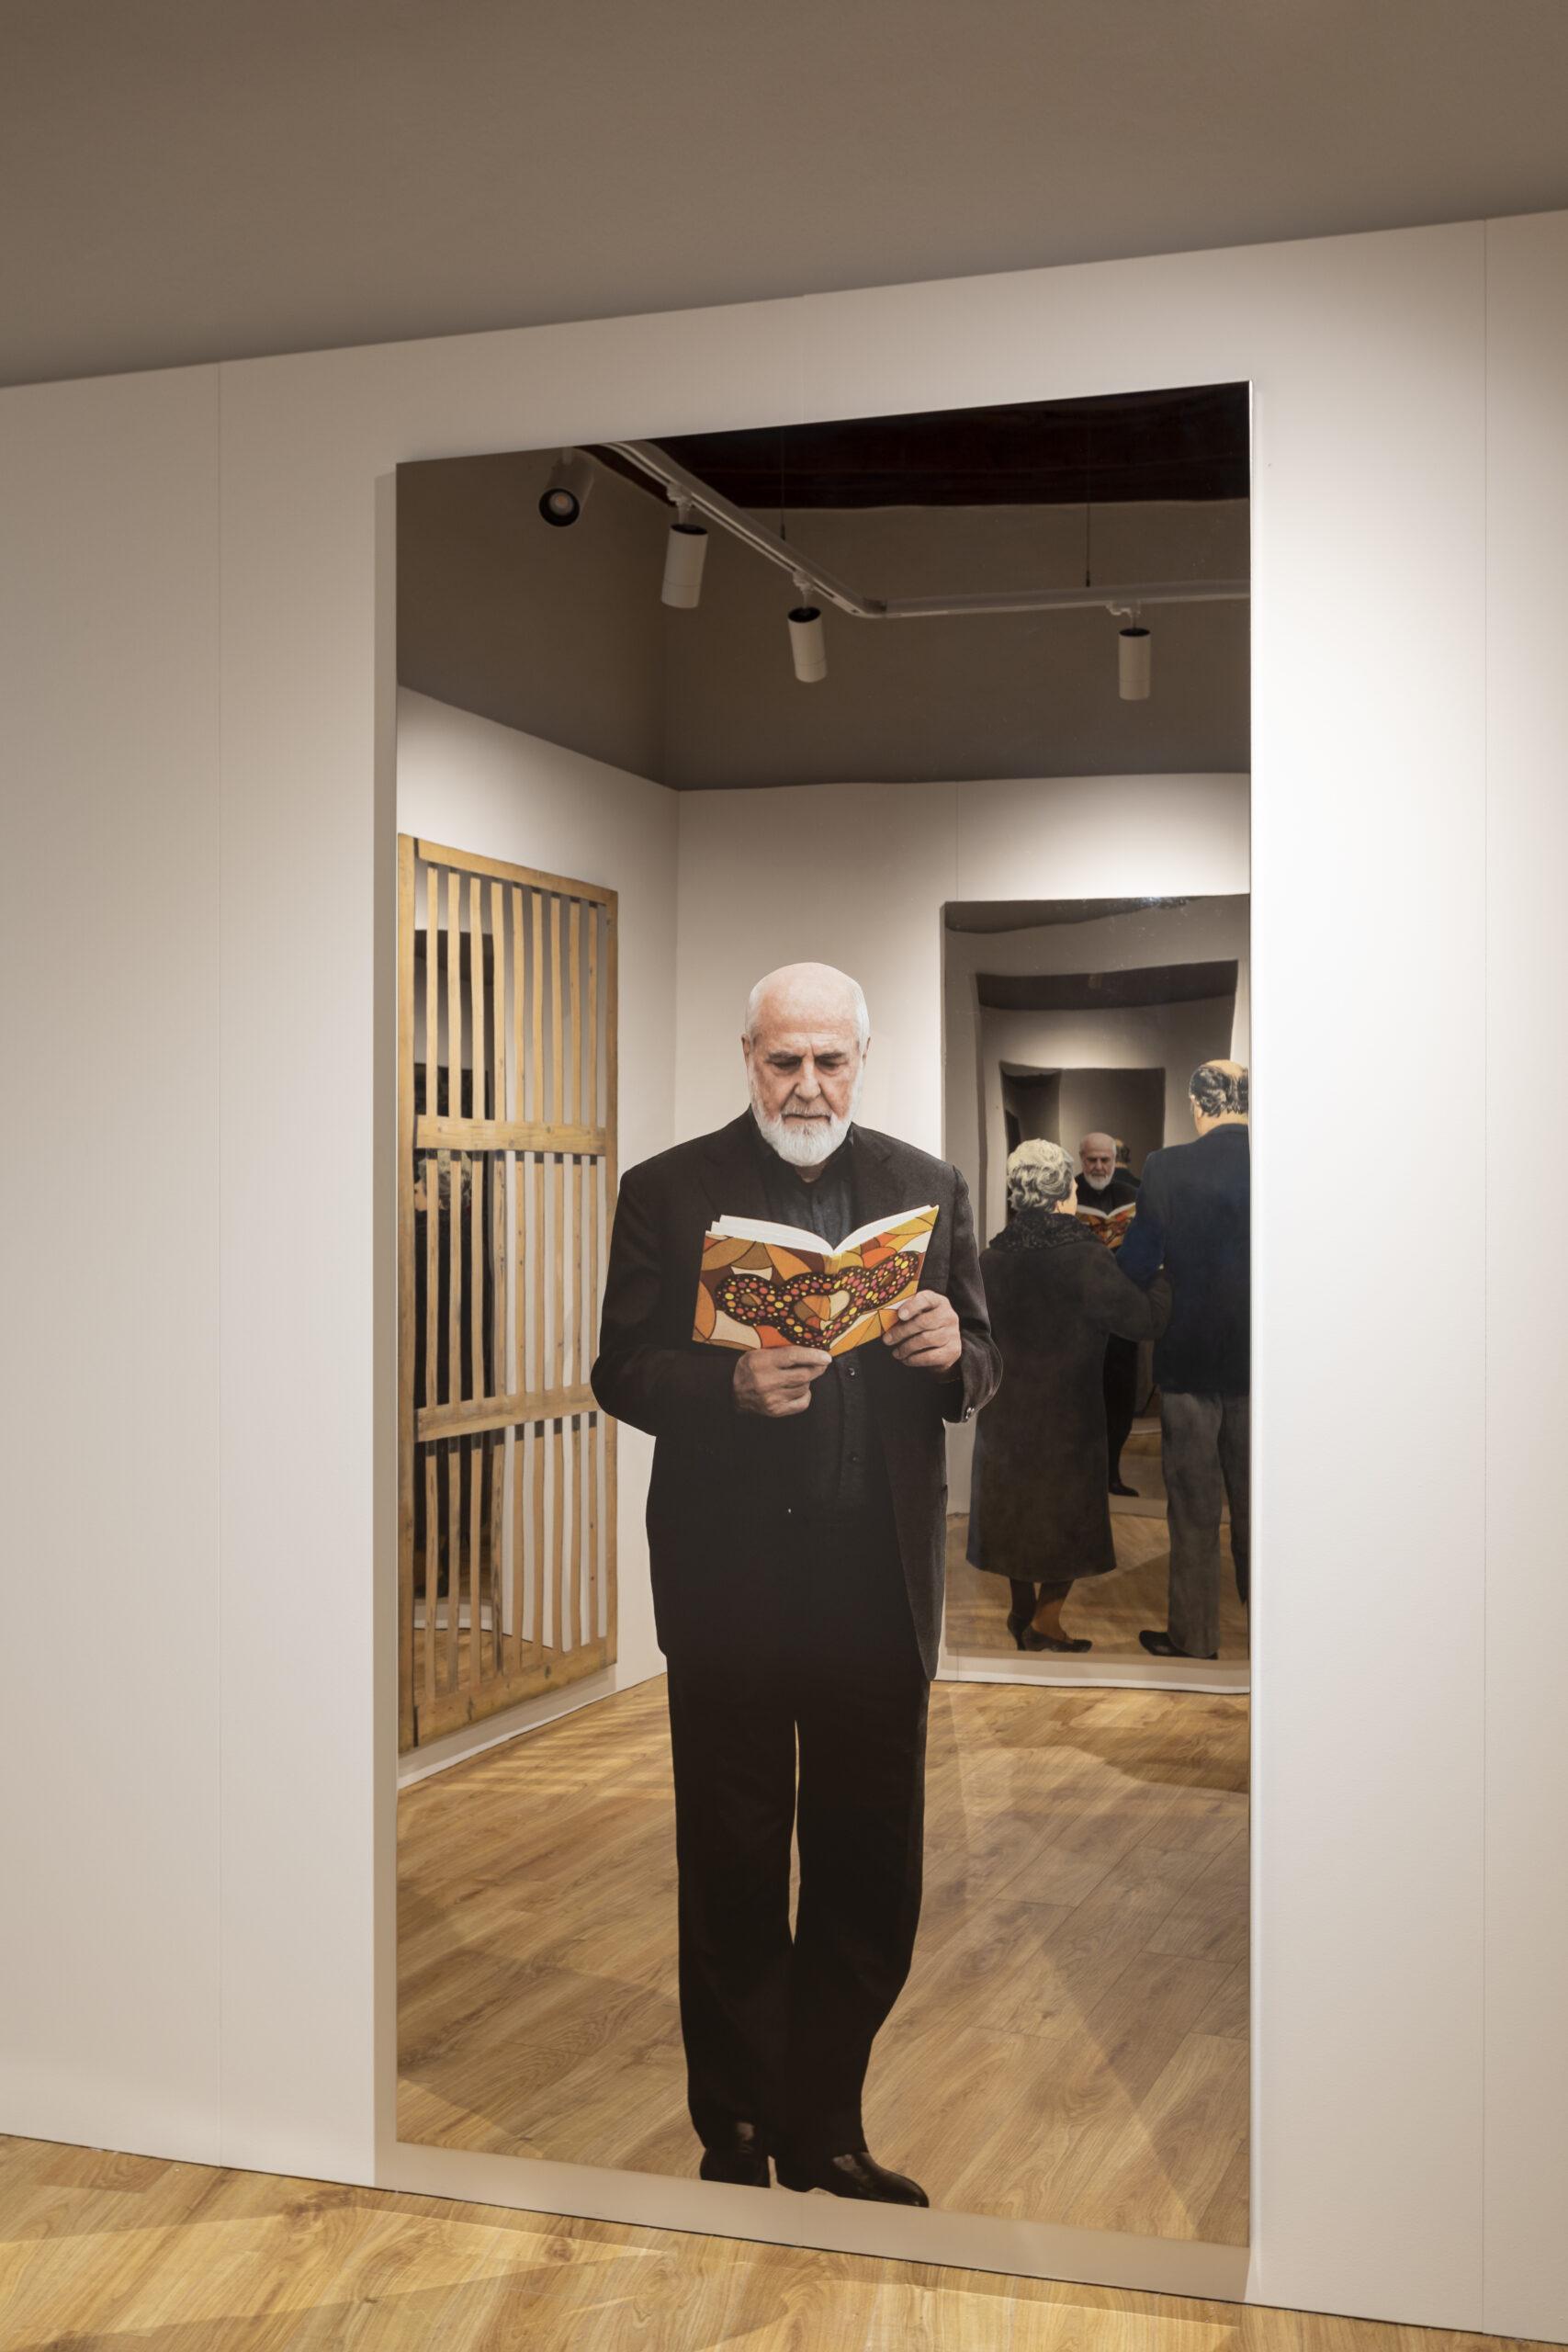 Michelangelo Pistoletto. Exhibition view at Museo Comunale d'Arte Moderna, Ascona 2021. Photo Alexandre Zveiger